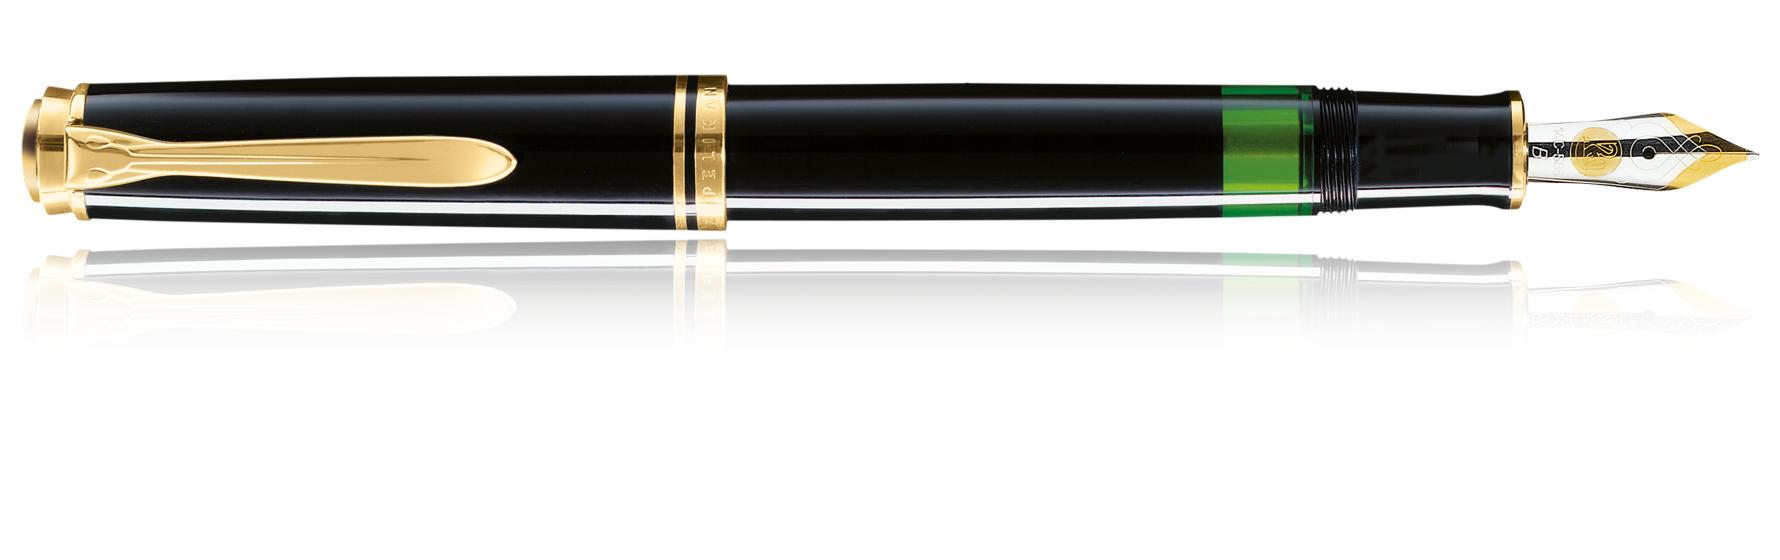 Pelikan Souverän M600 - Schwarz - Gold - Blau - Gold - 1 Stück(e)